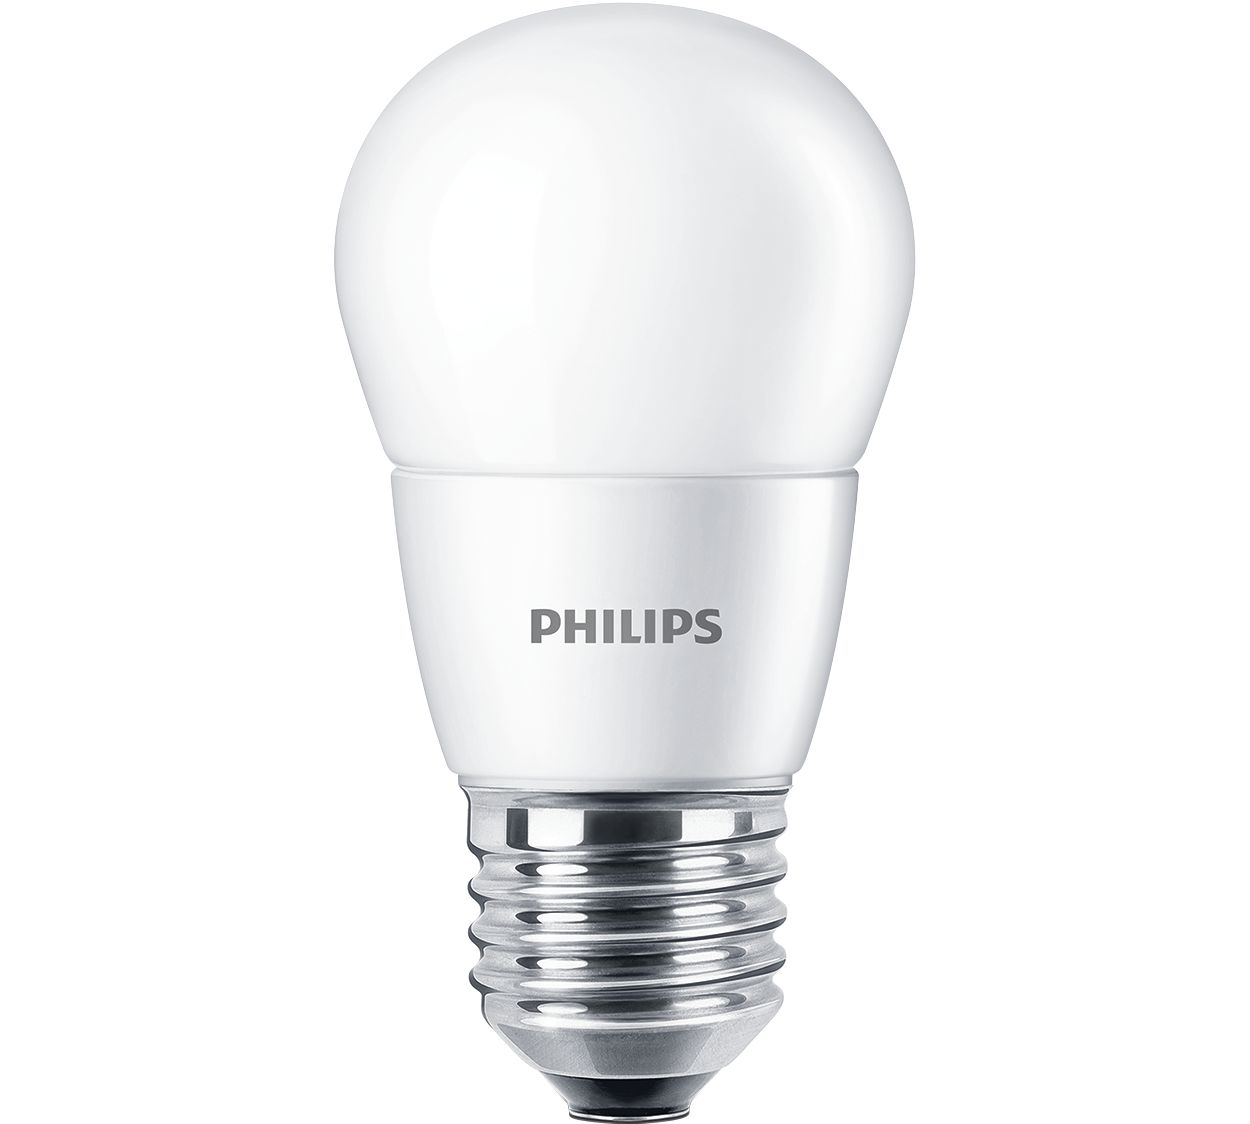 Philips - Lampadina a LED - Corelus40840